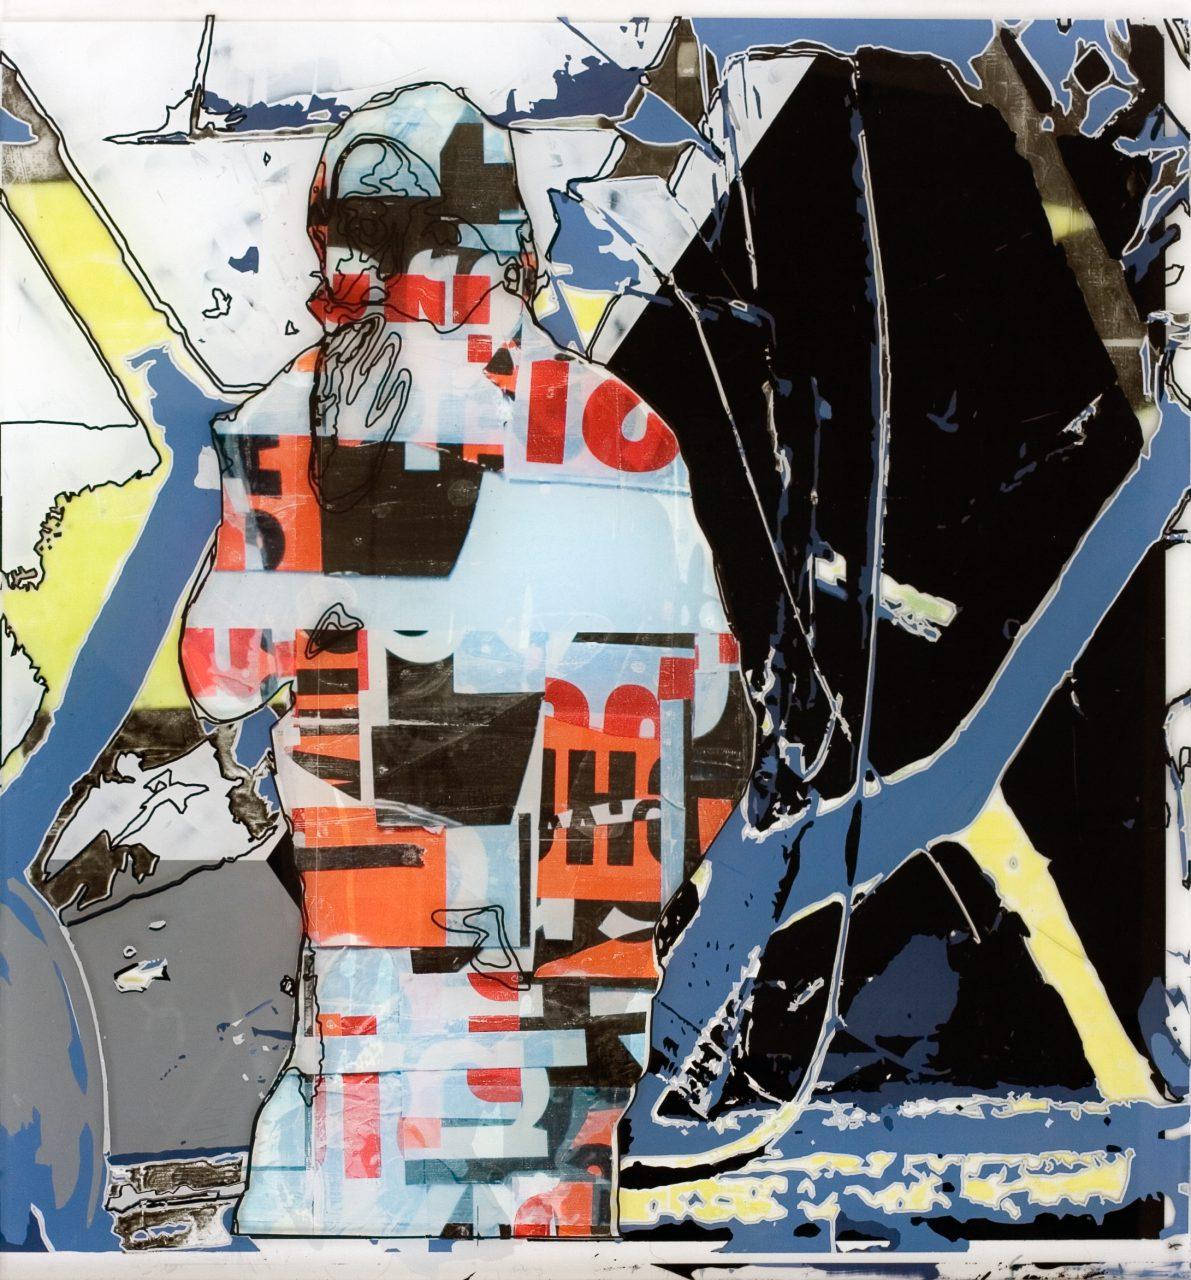 ME, 75cm x 70cm x 0,6cm, 2015 / Acrylic paint, image transfer on acrylic glass